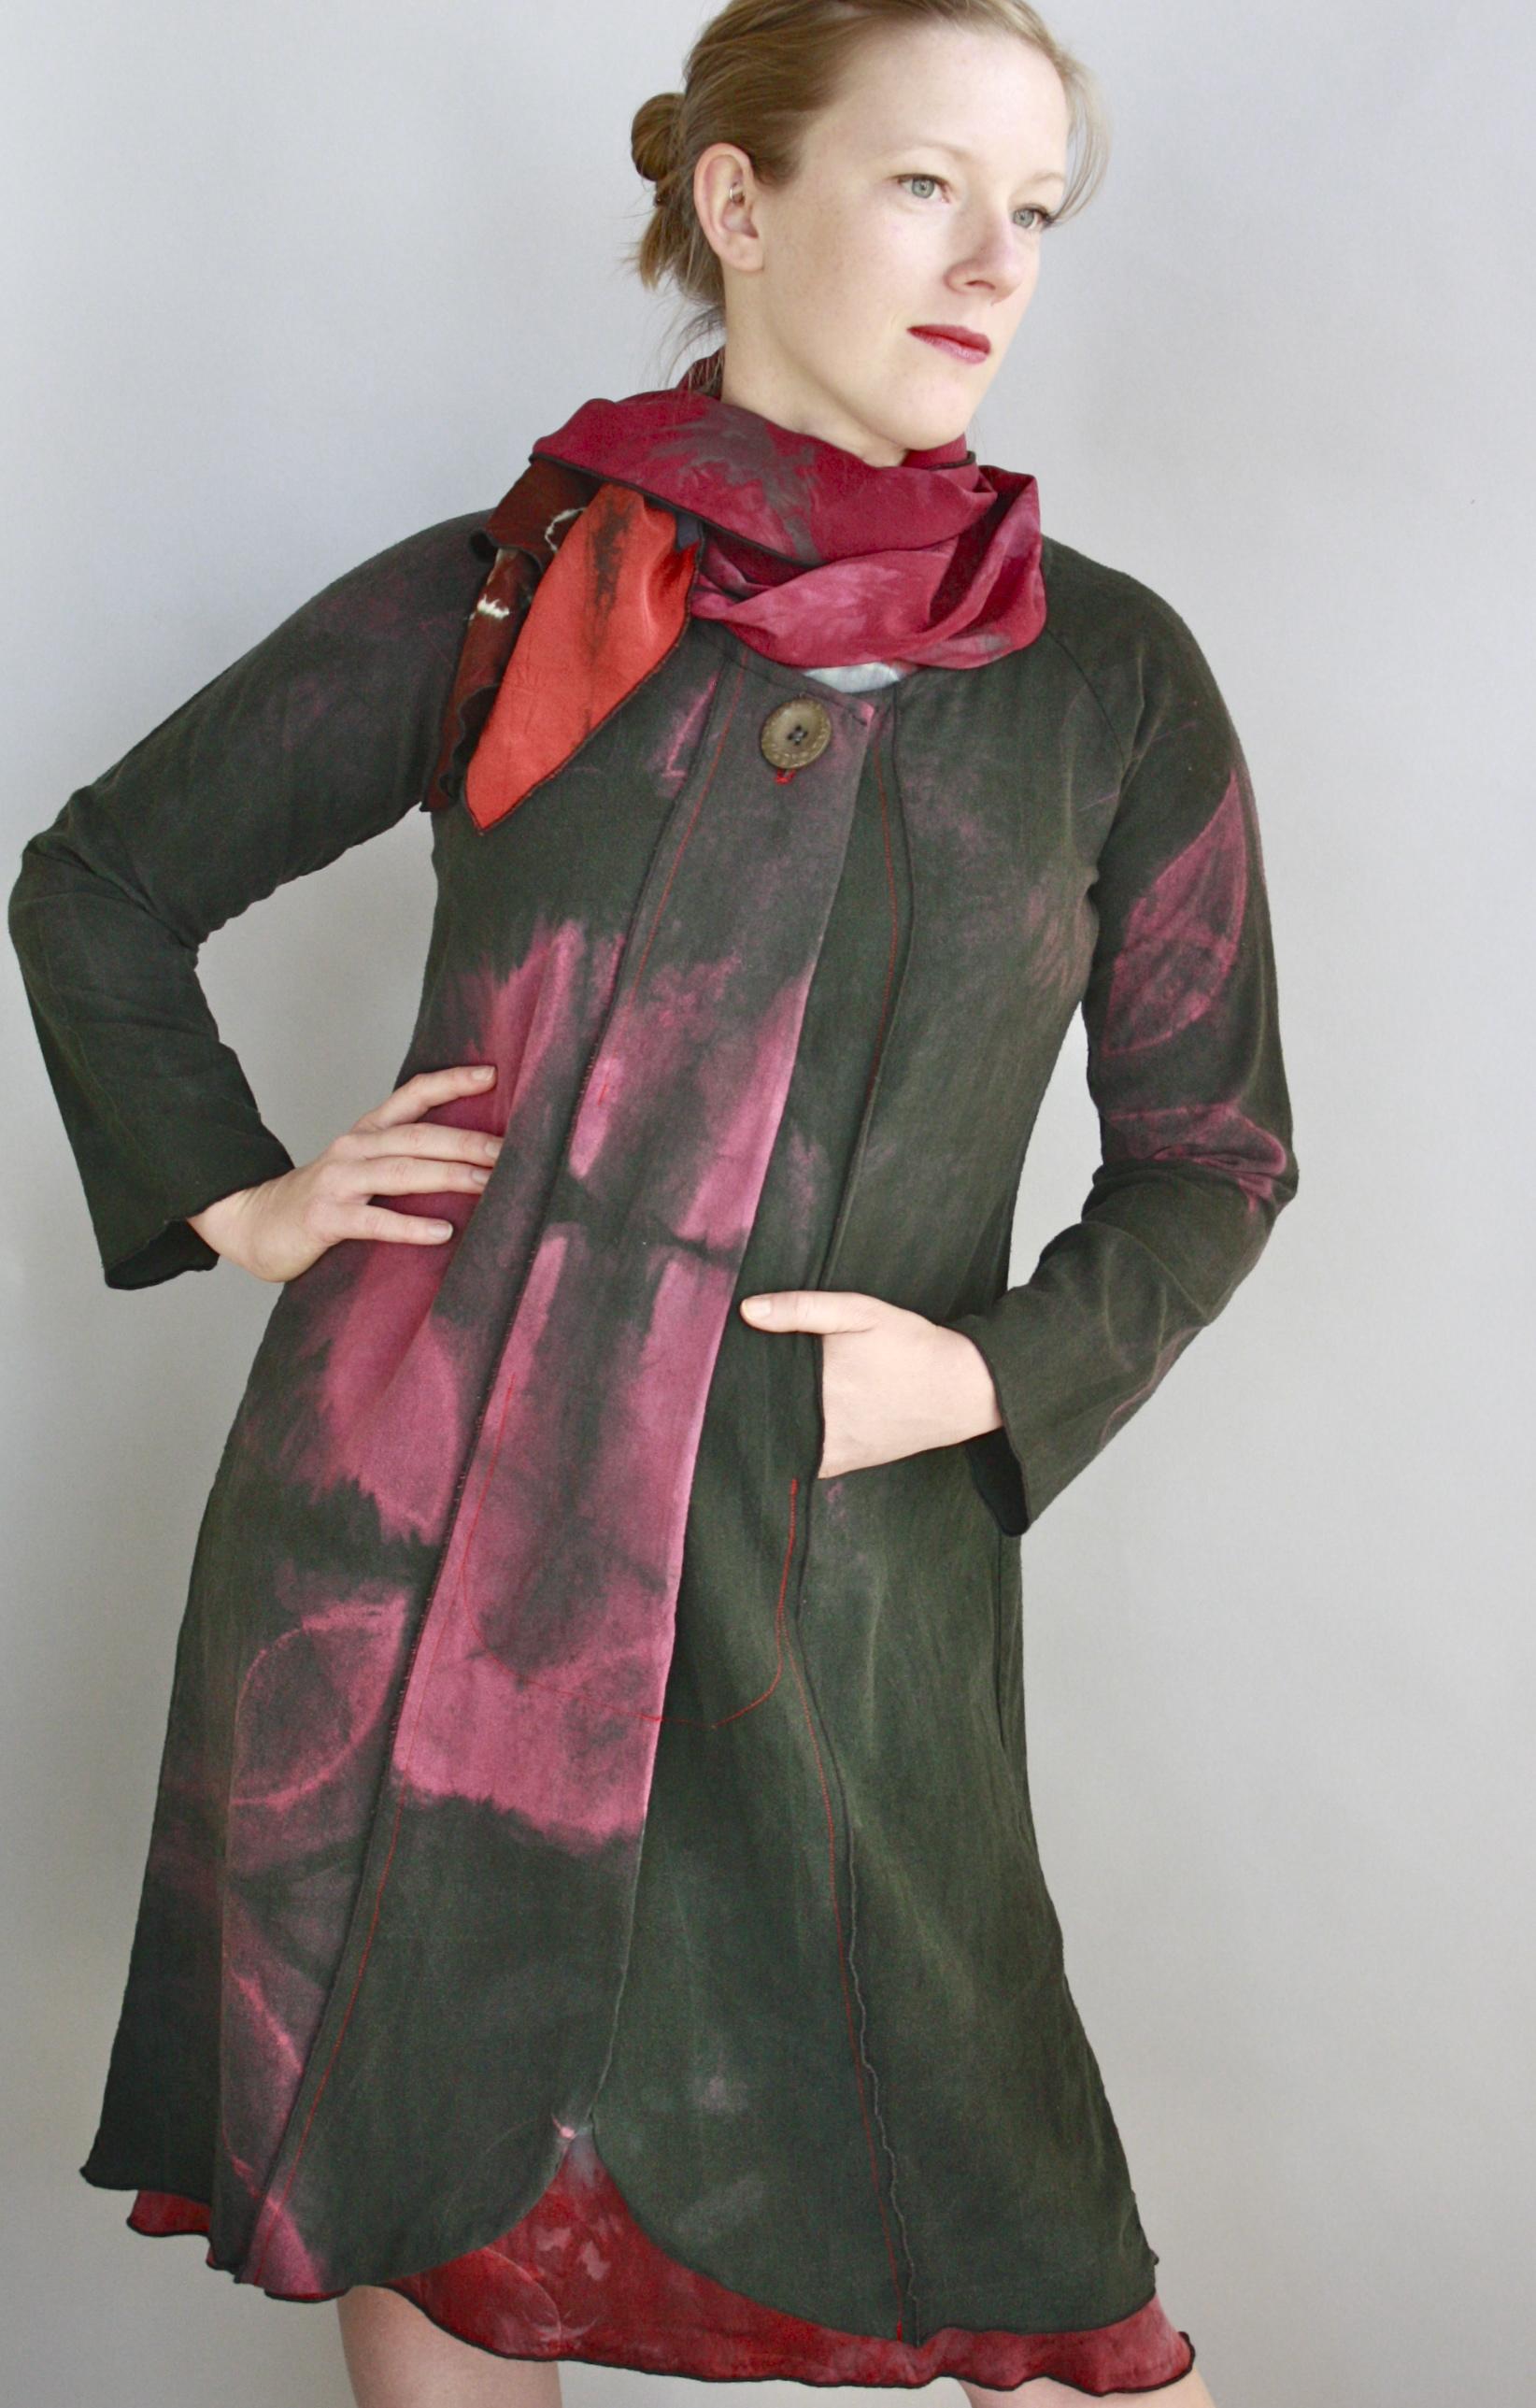 Raw Silk Coat & Collage Scarf.